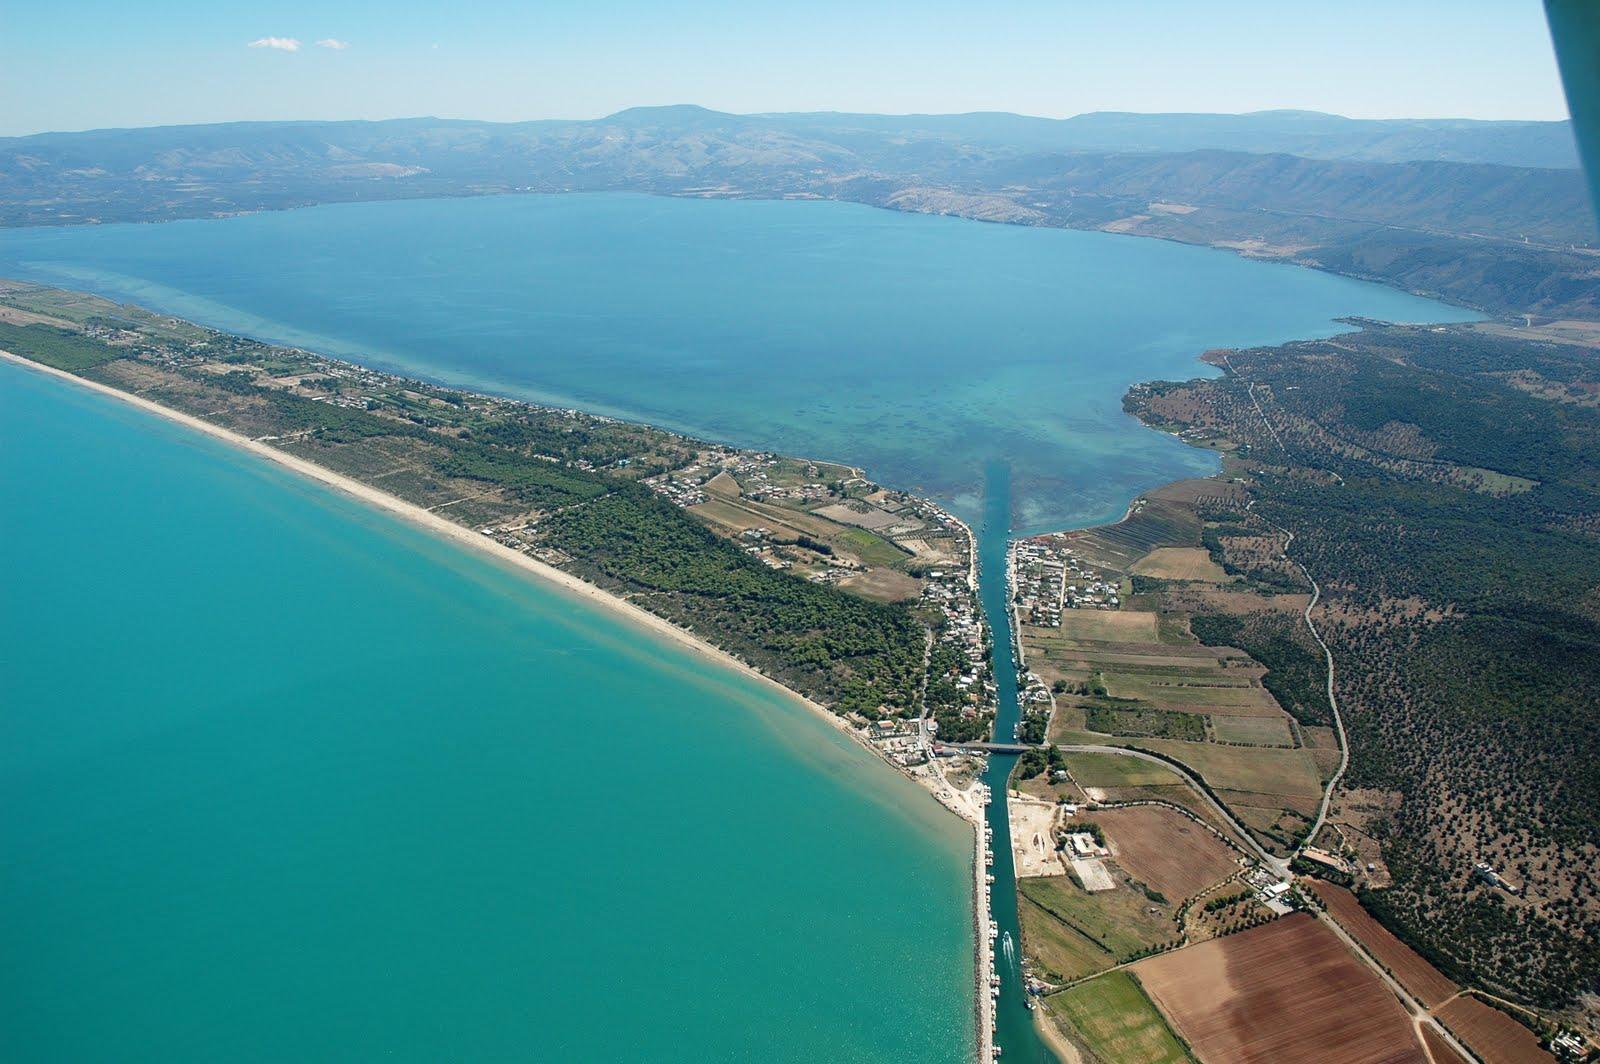 lago-di-varano-1